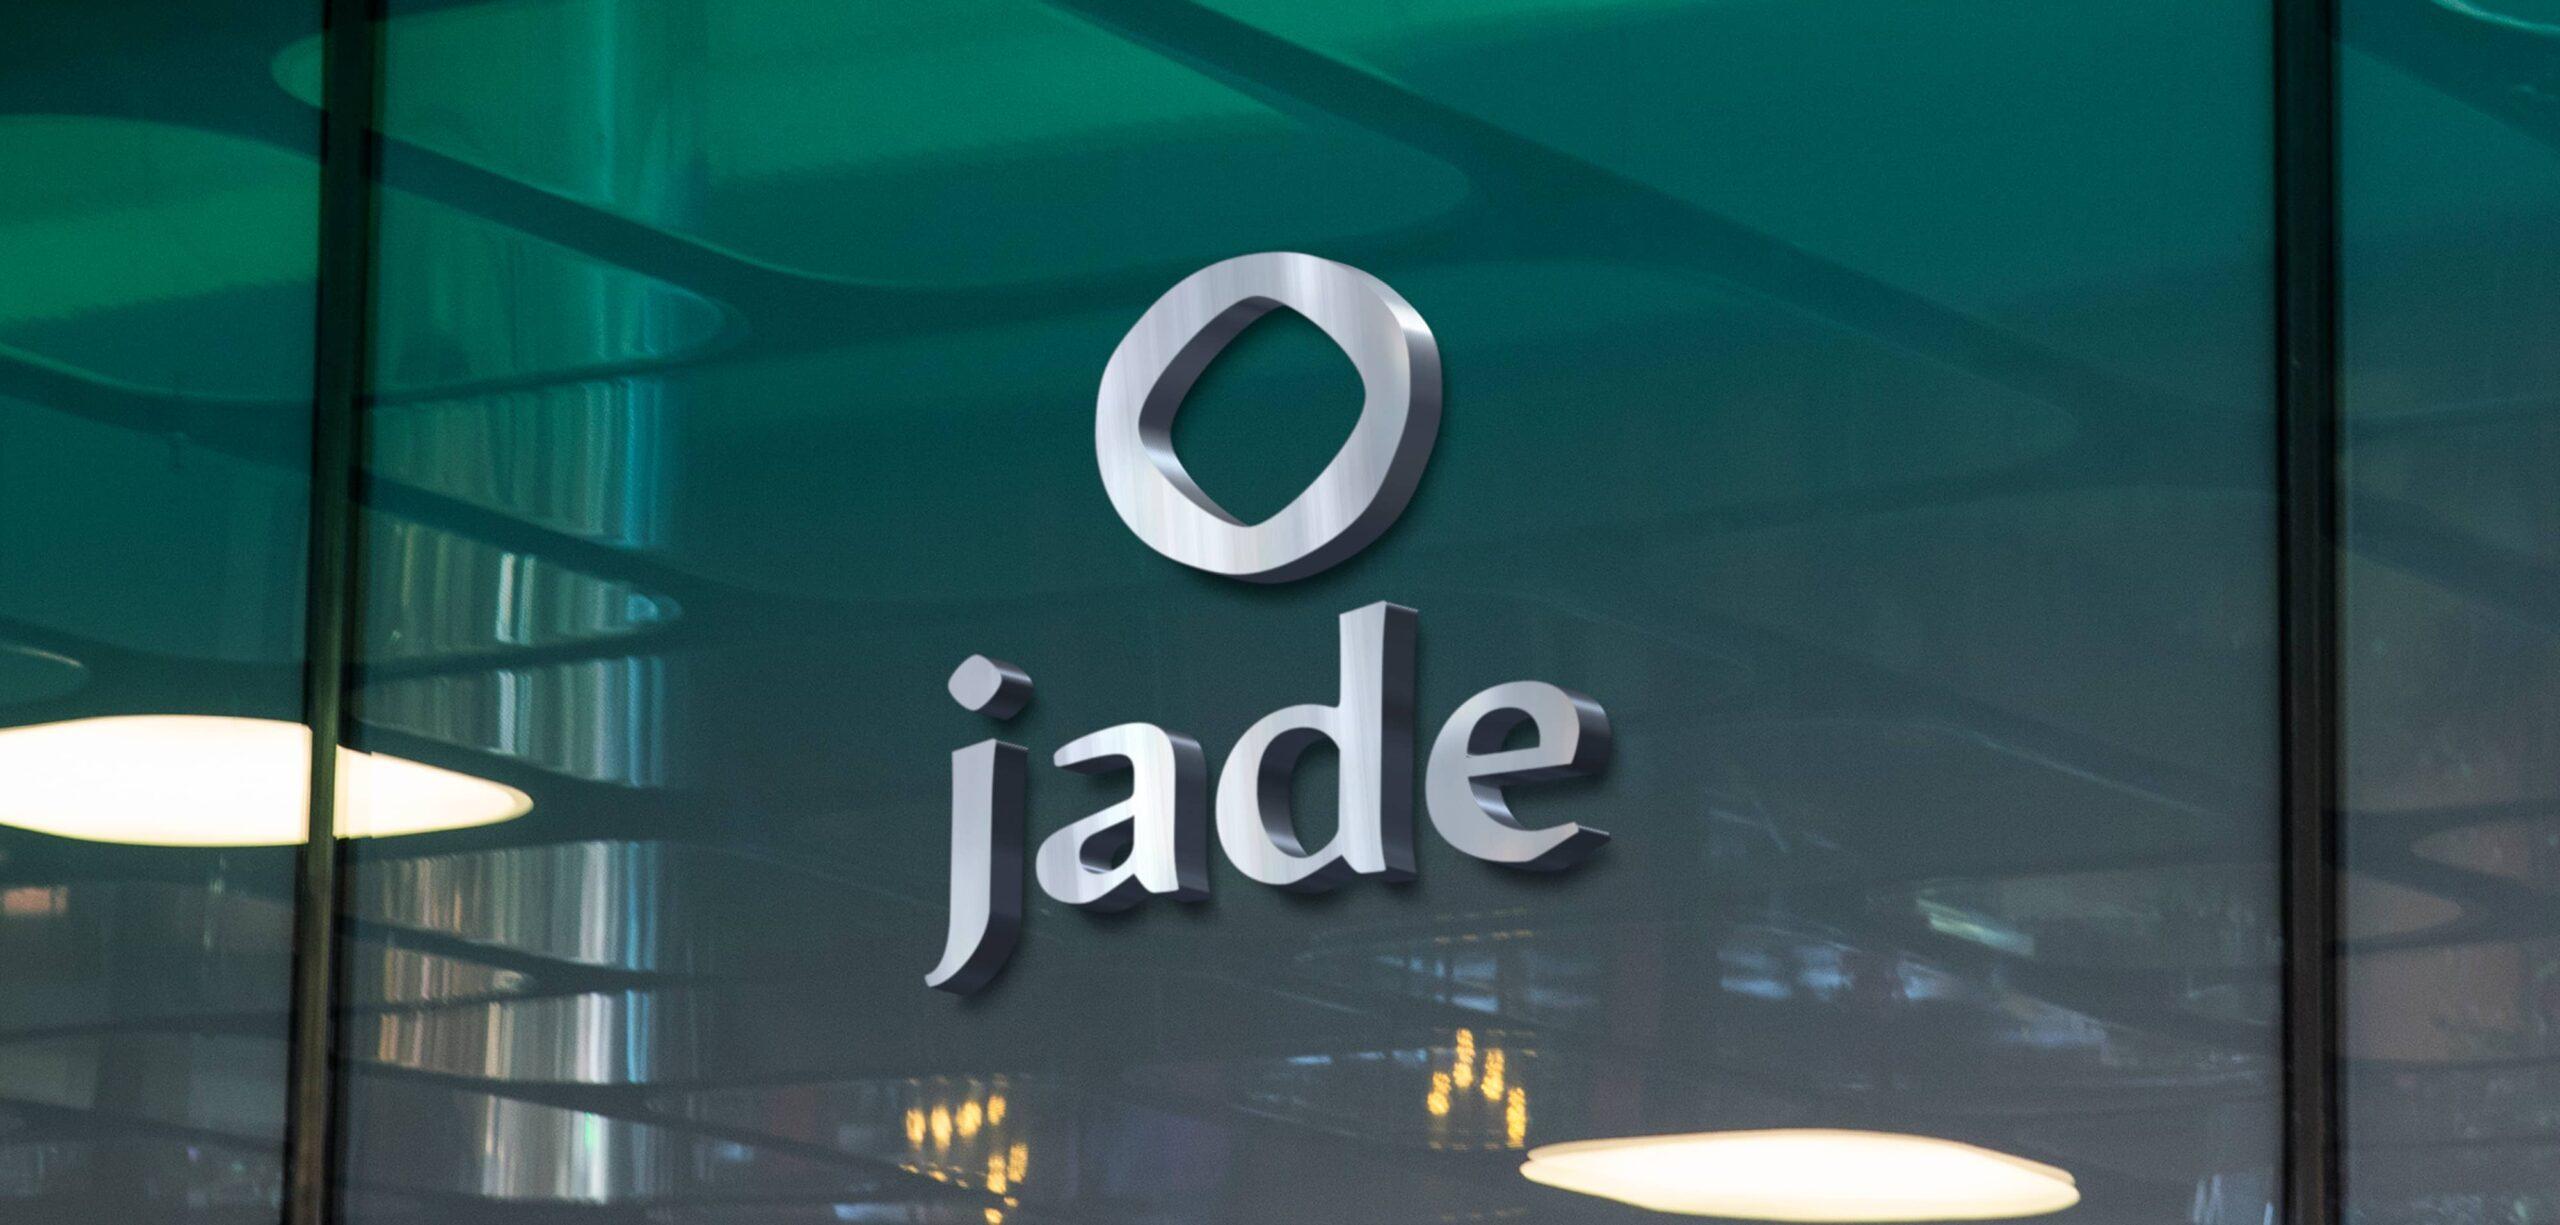 REV-Wall-jade-glass